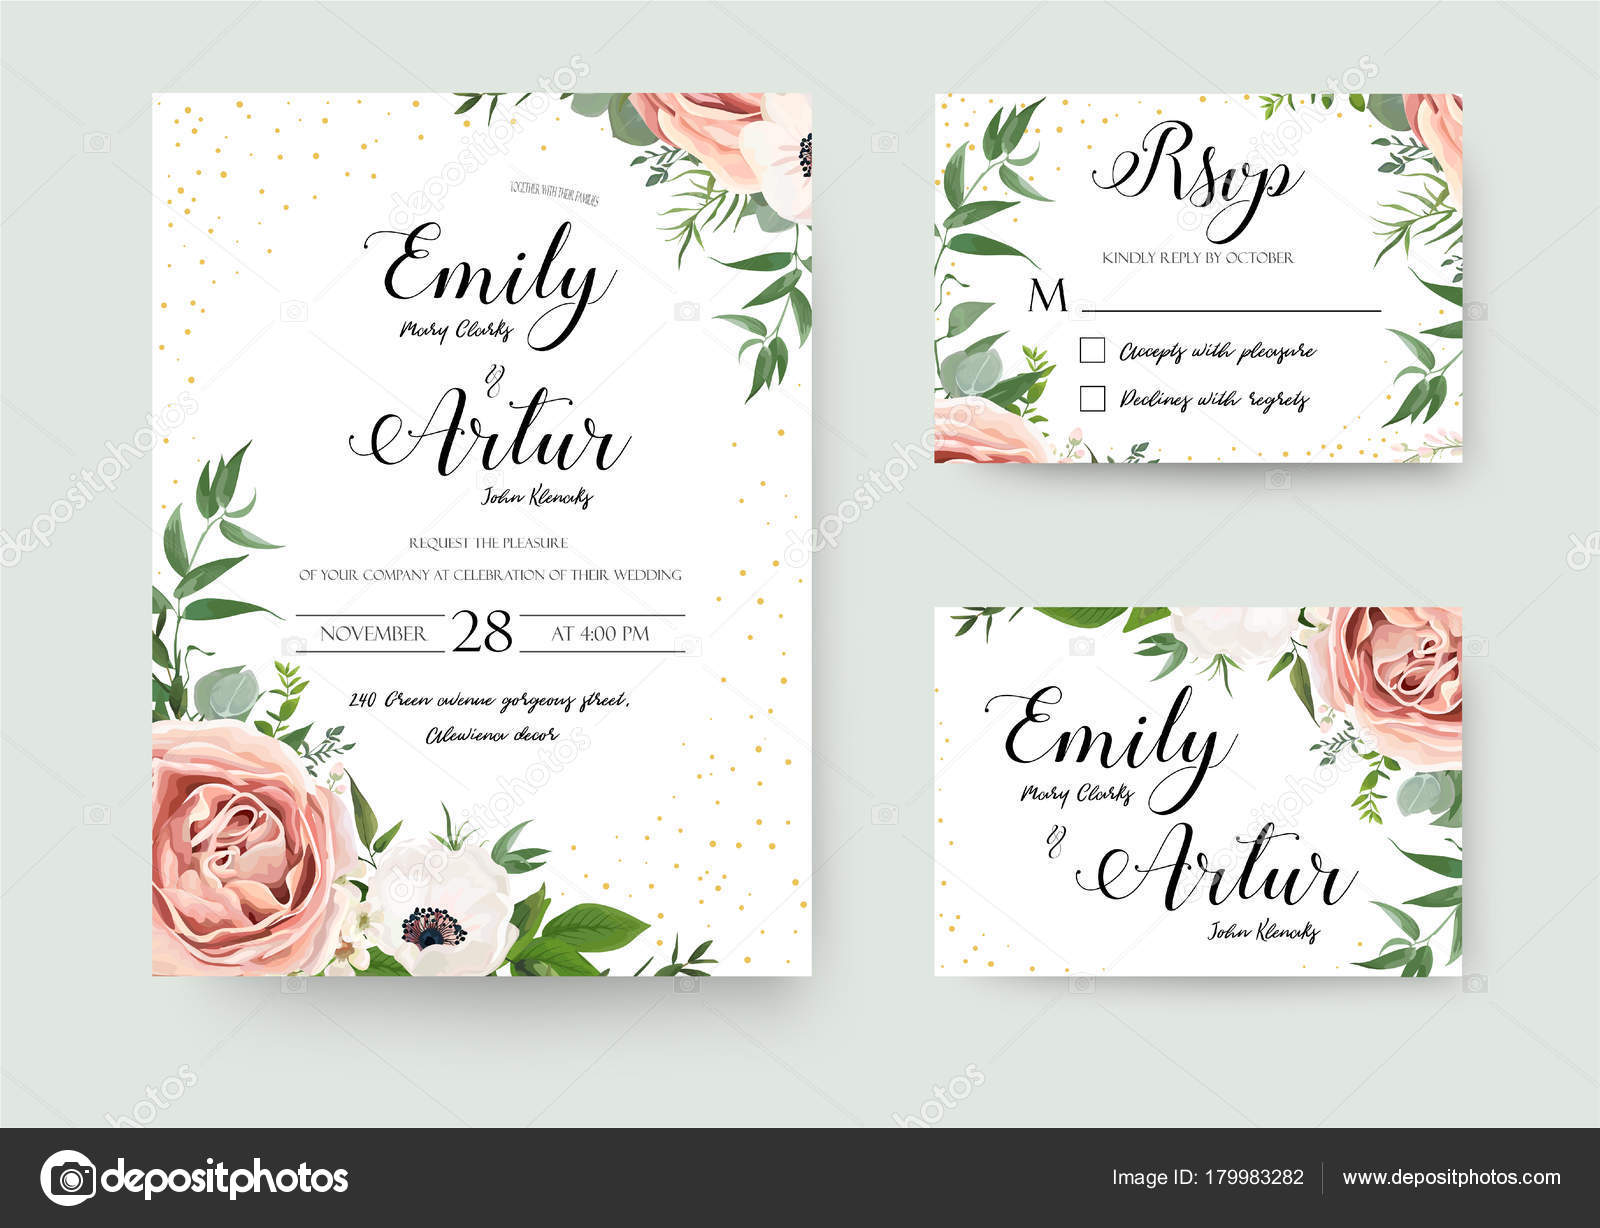 Vector Wedding Invitations: Vetor Floral Convite Convite Obrigado Casamento Rsvp